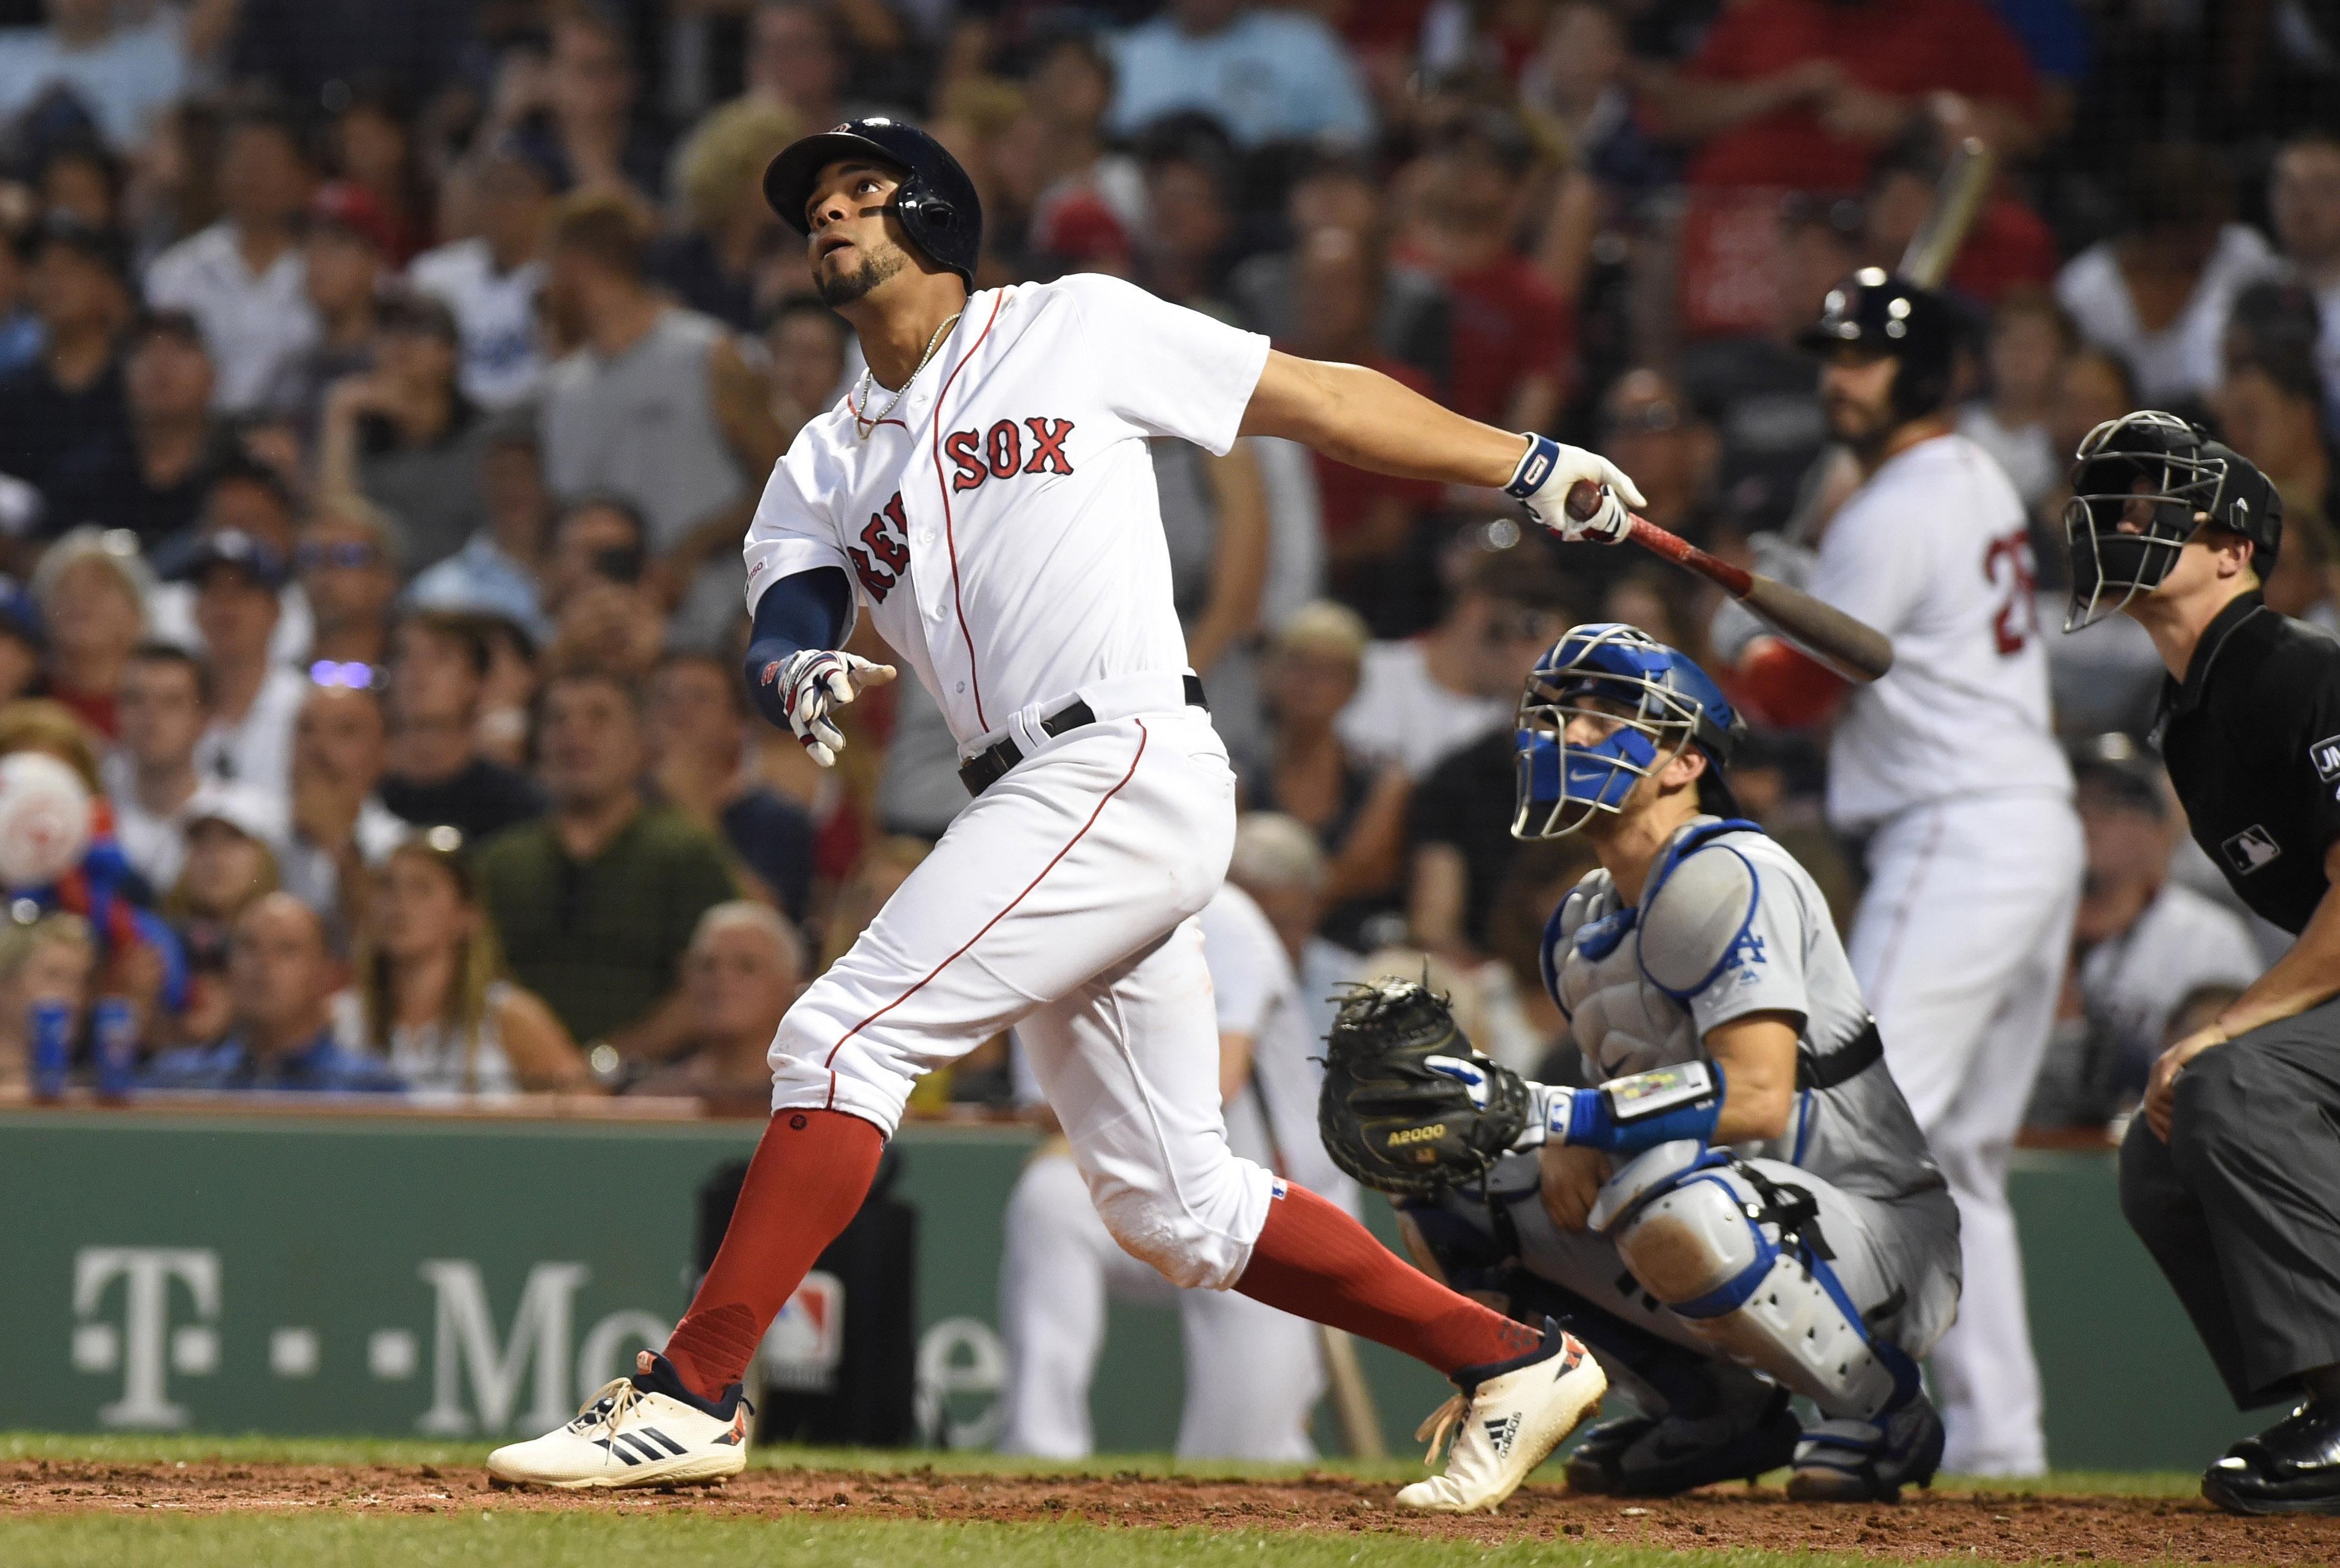 MLB: Los Angeles Dodgers at Boston Red Sox